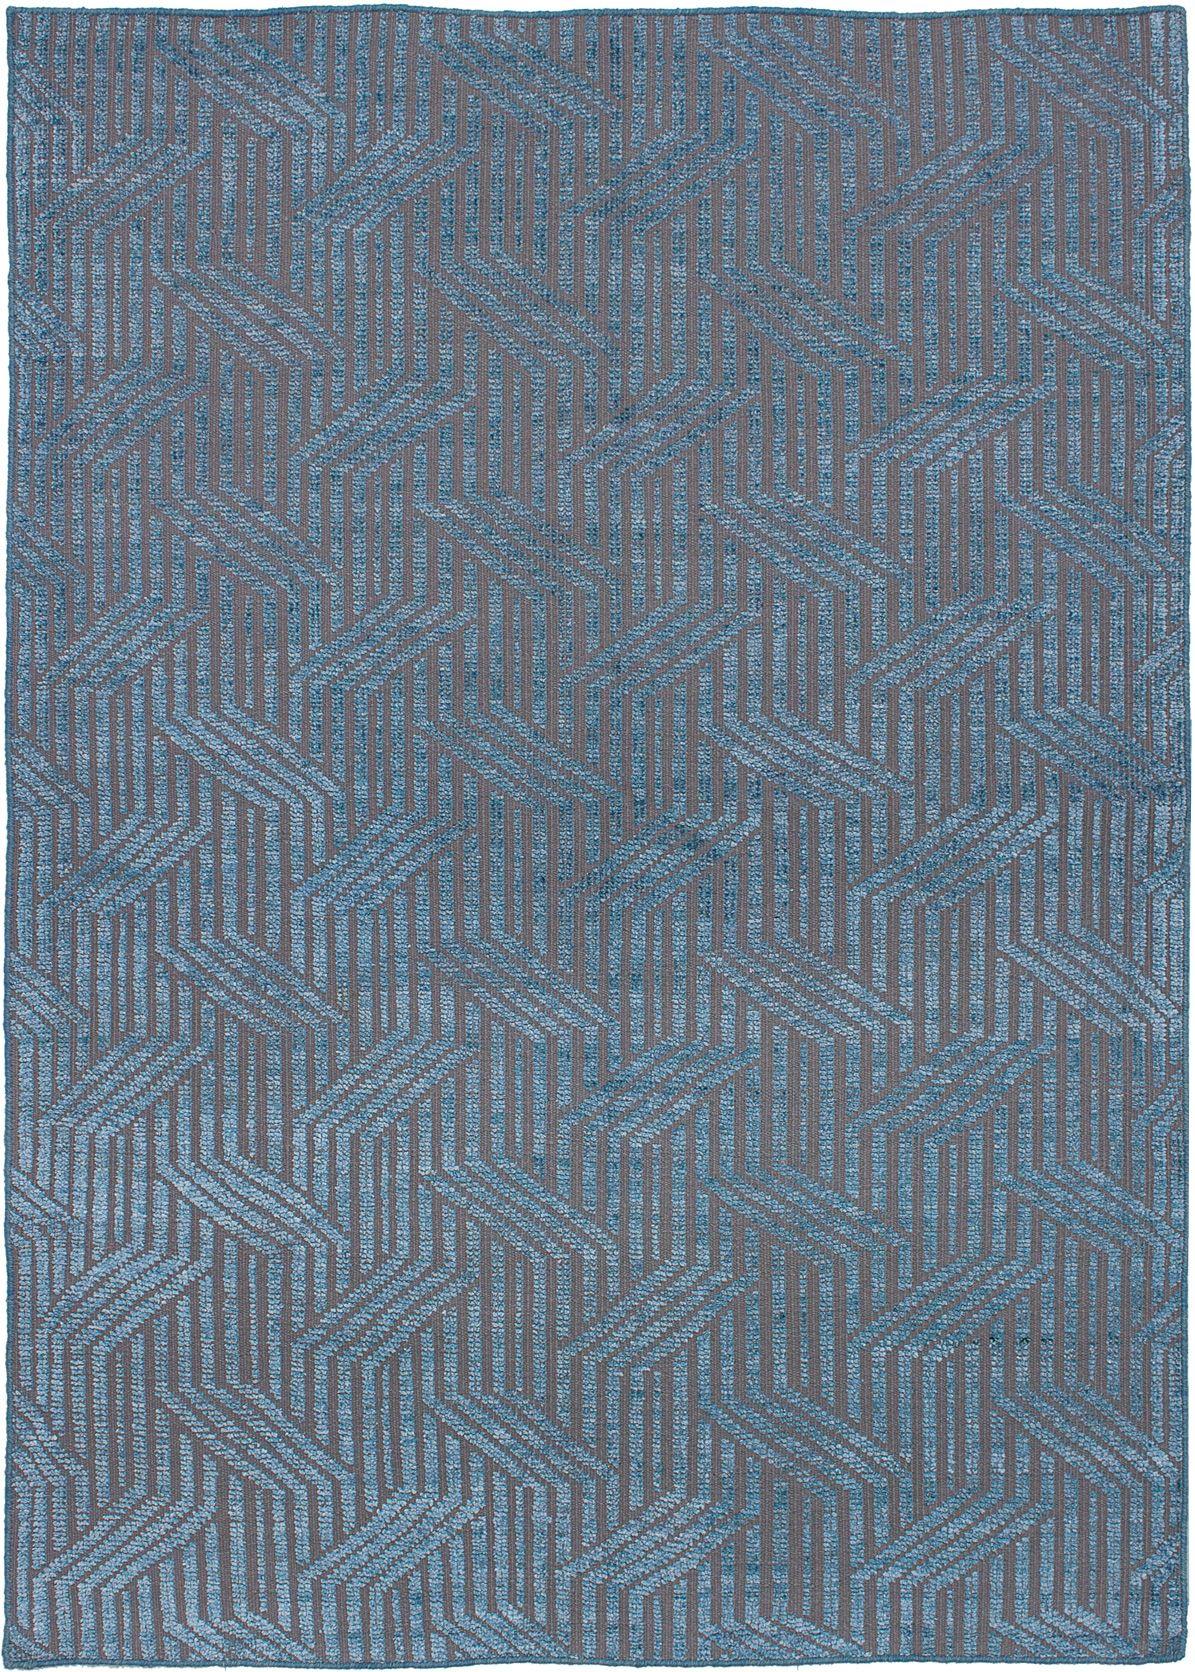 "Hand-knotted La Seda Sky Blue  Rug 5'3"" x 7'4"" Size: 5'3"" x 7'4"""